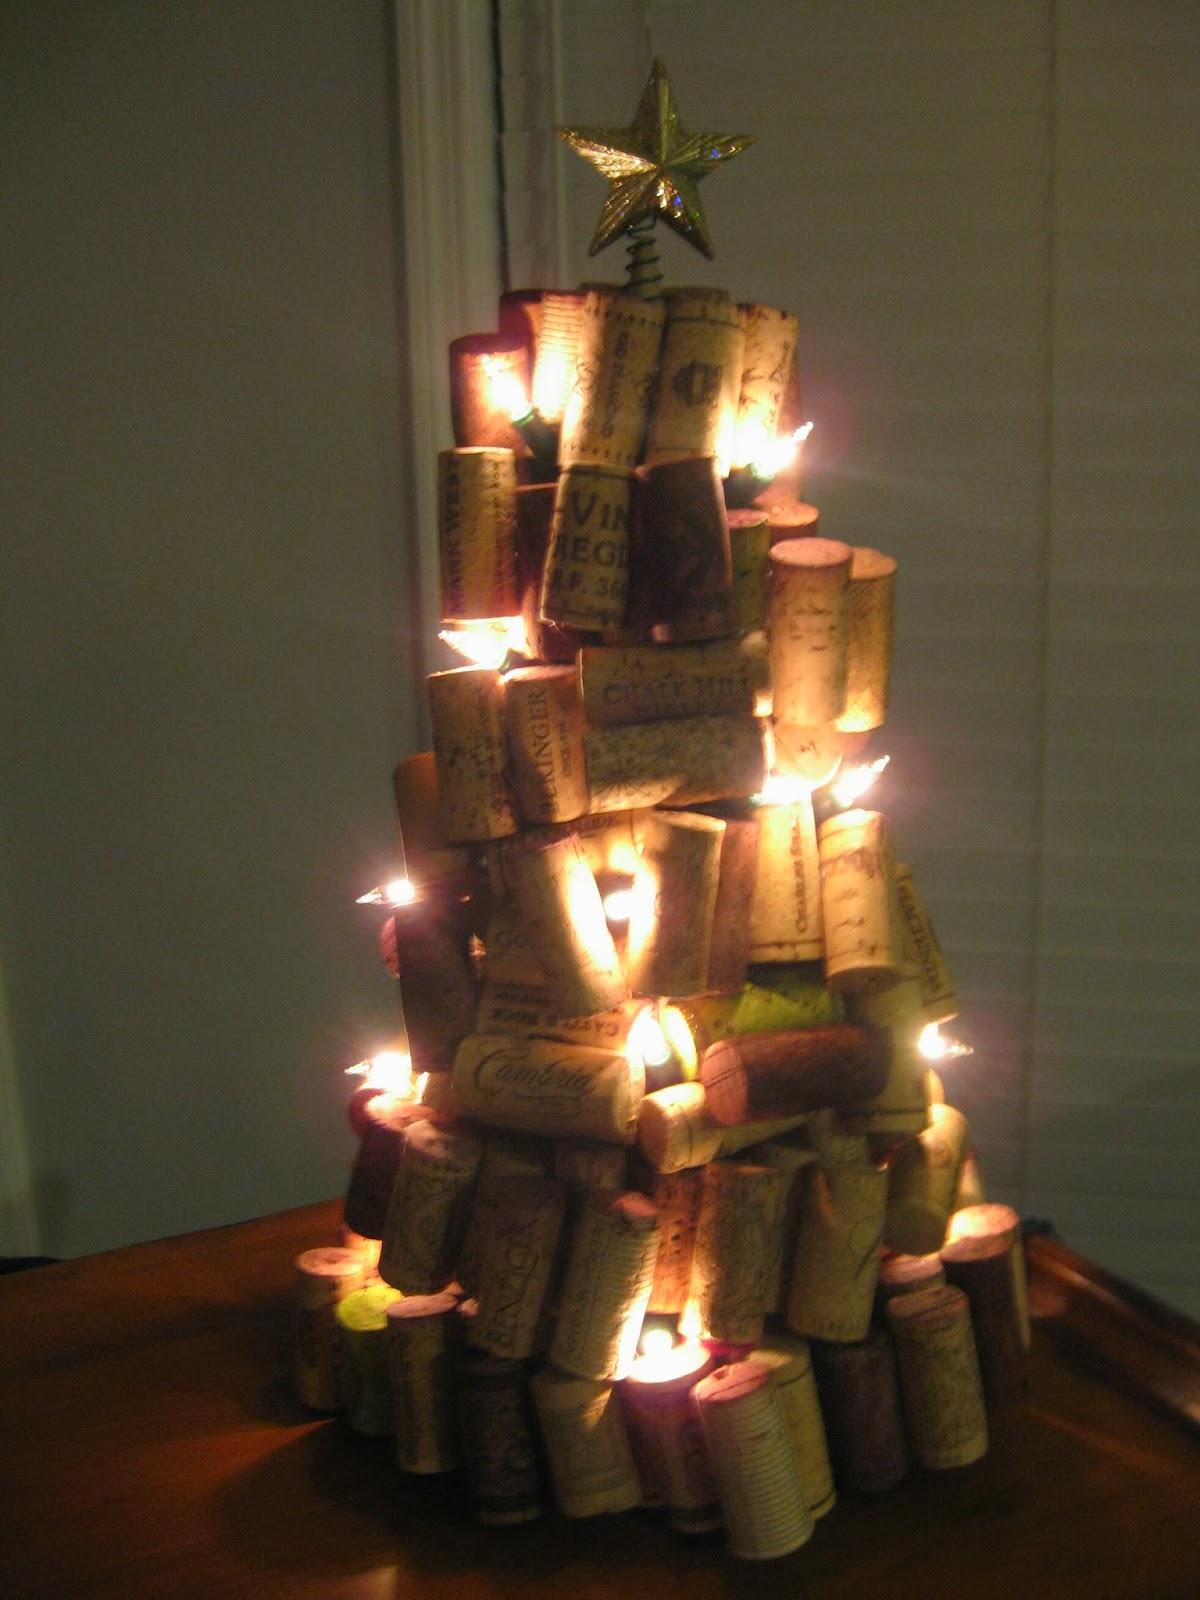 Excellent Christmassy Uses For Corks Vinspire